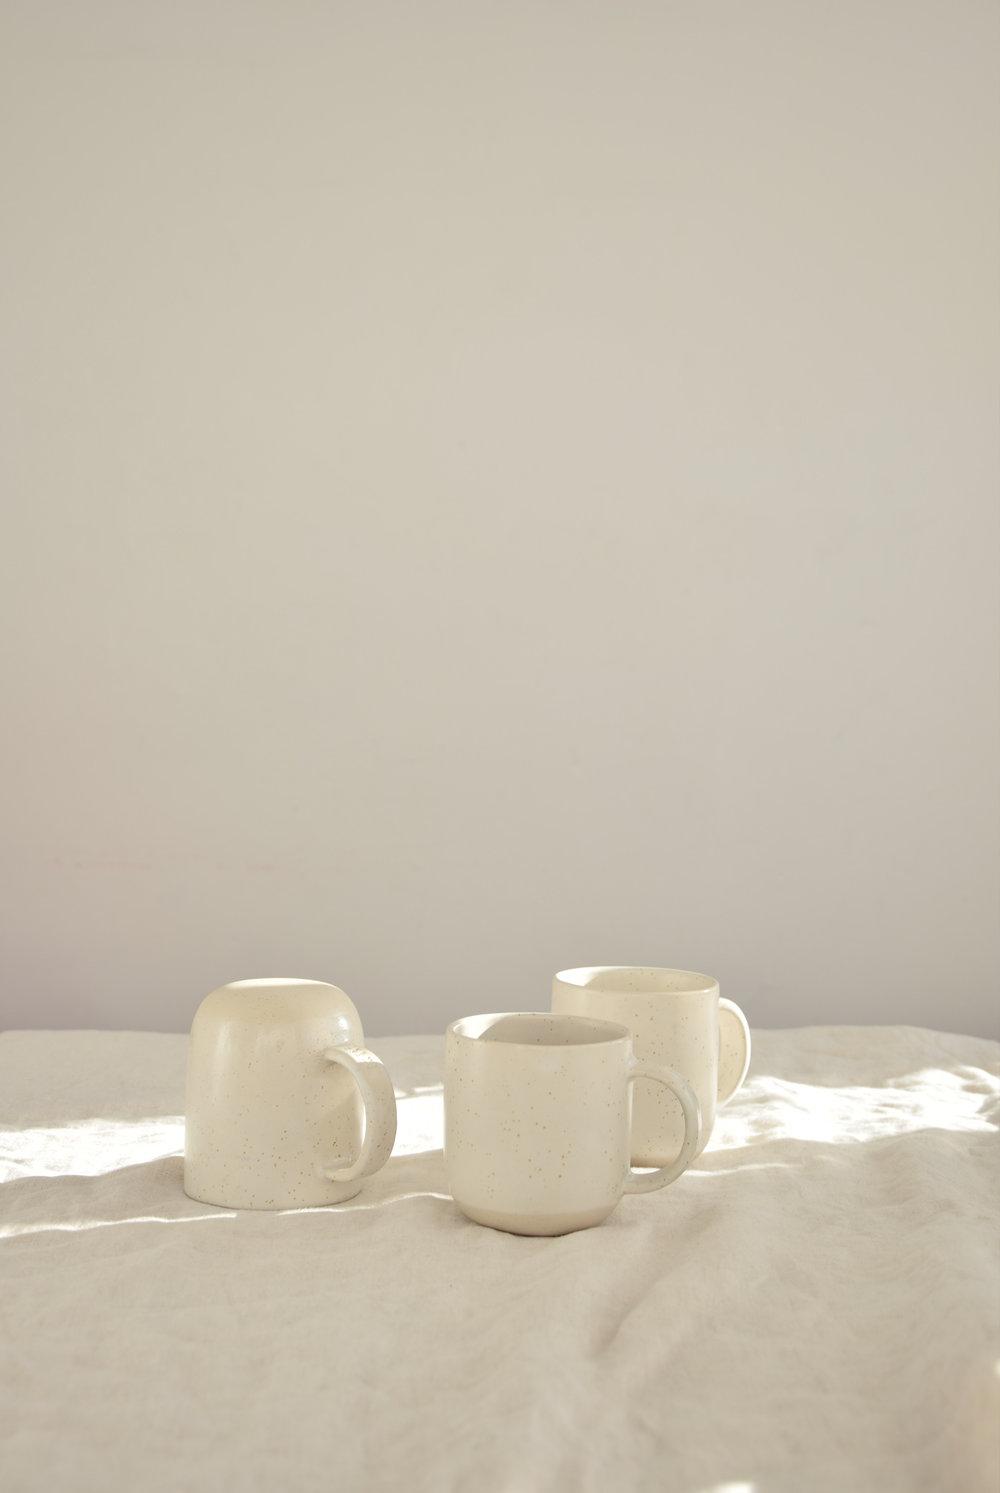 whitespeckledcup-03-studiokryszewski.jpg